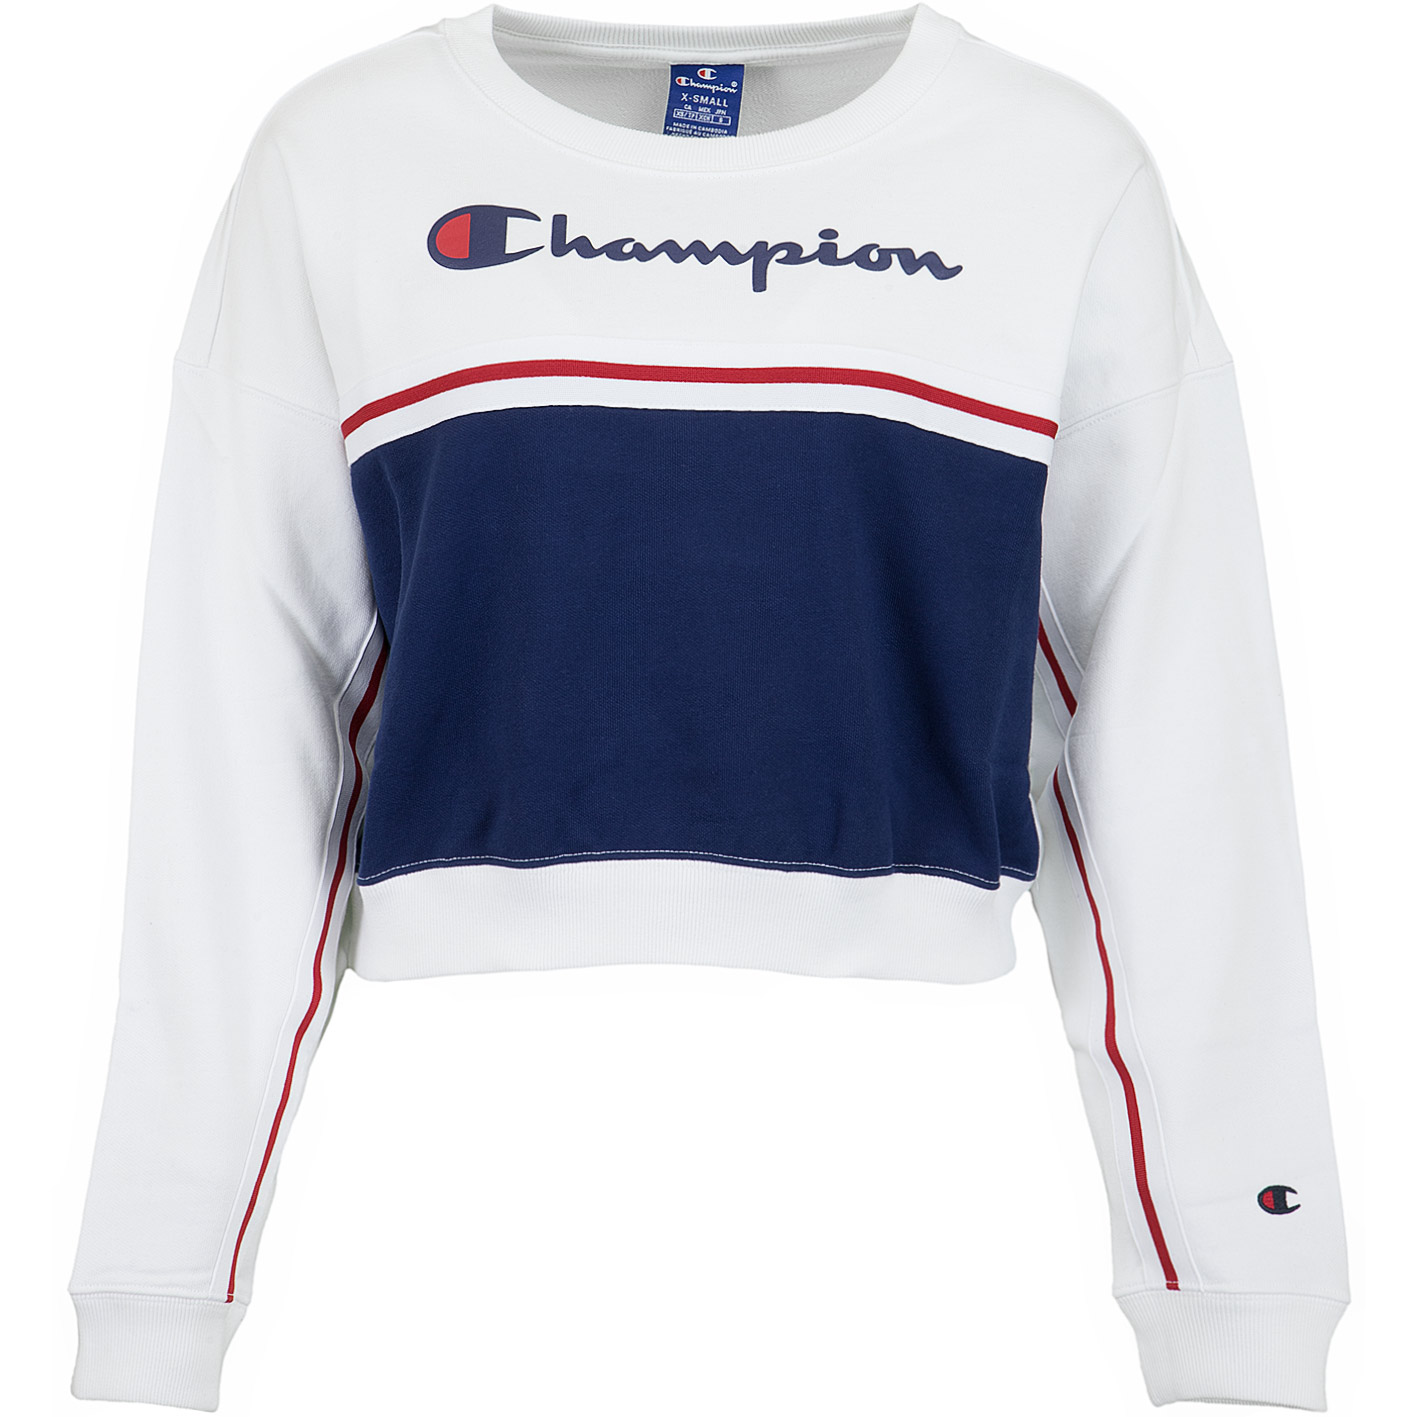 official photos b4b10 dd75b Champion Damen Sweatshirt Croptop weiß/dunkelblau